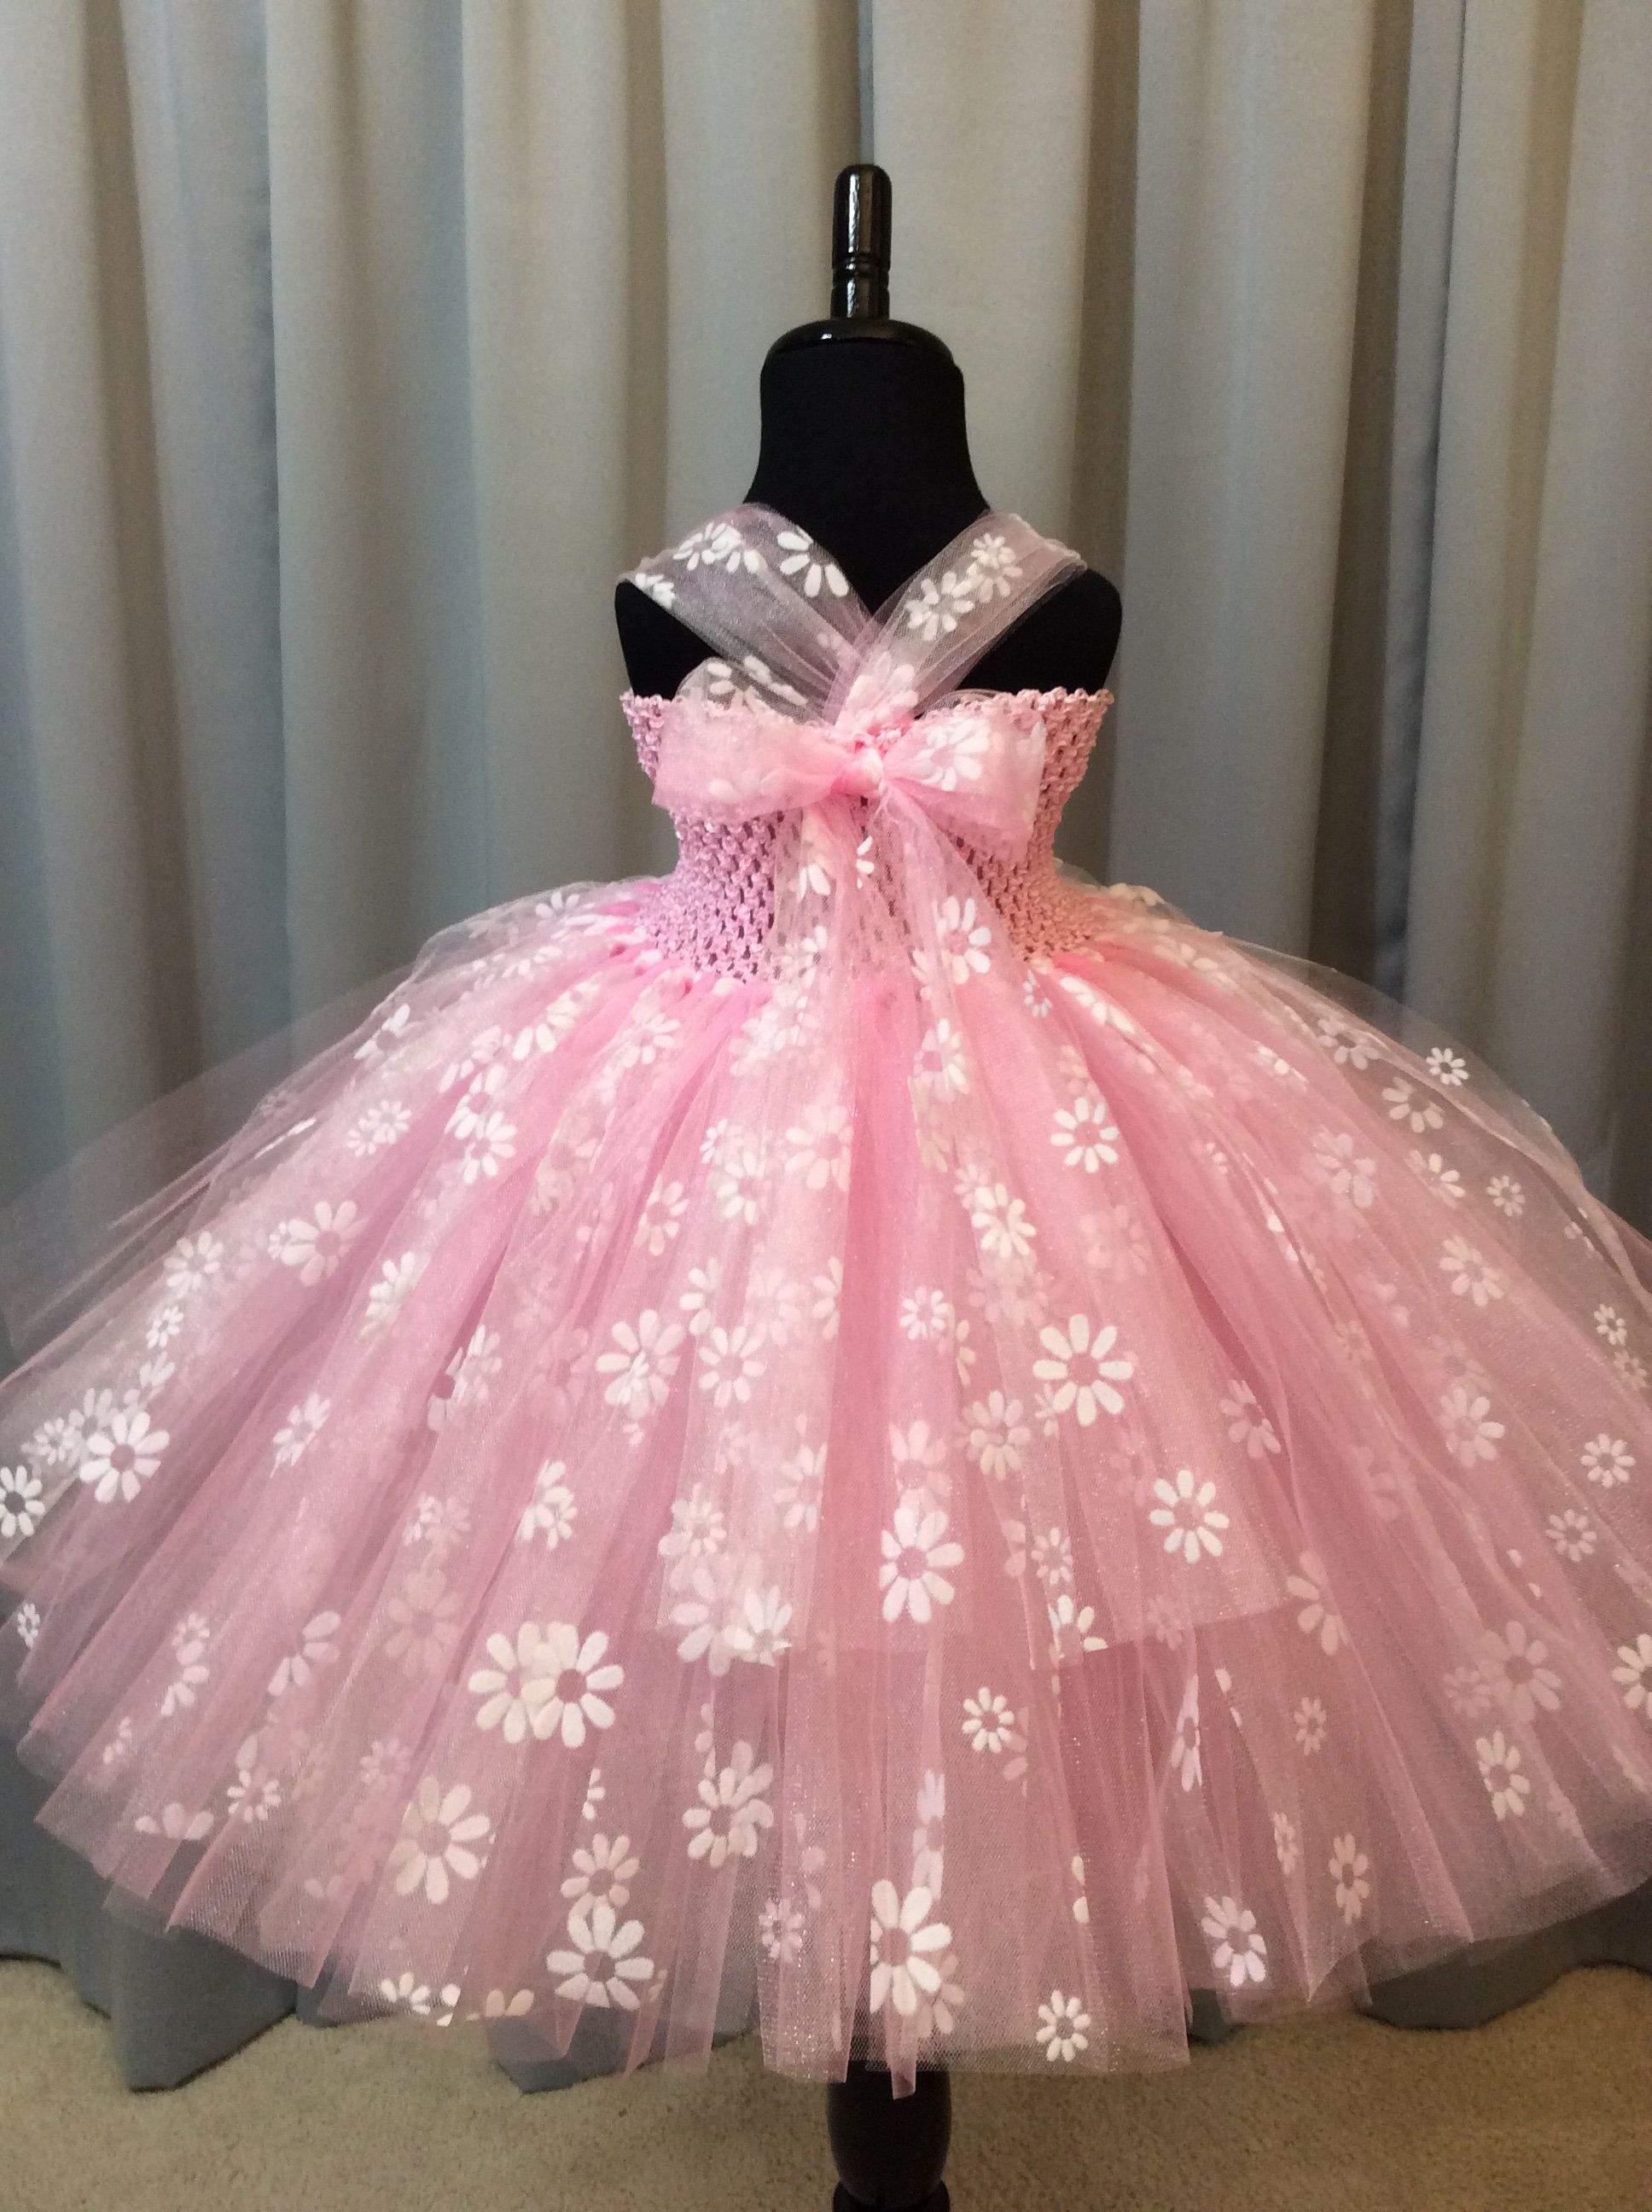 720f37167 Pink princess tutu dress with white flowers